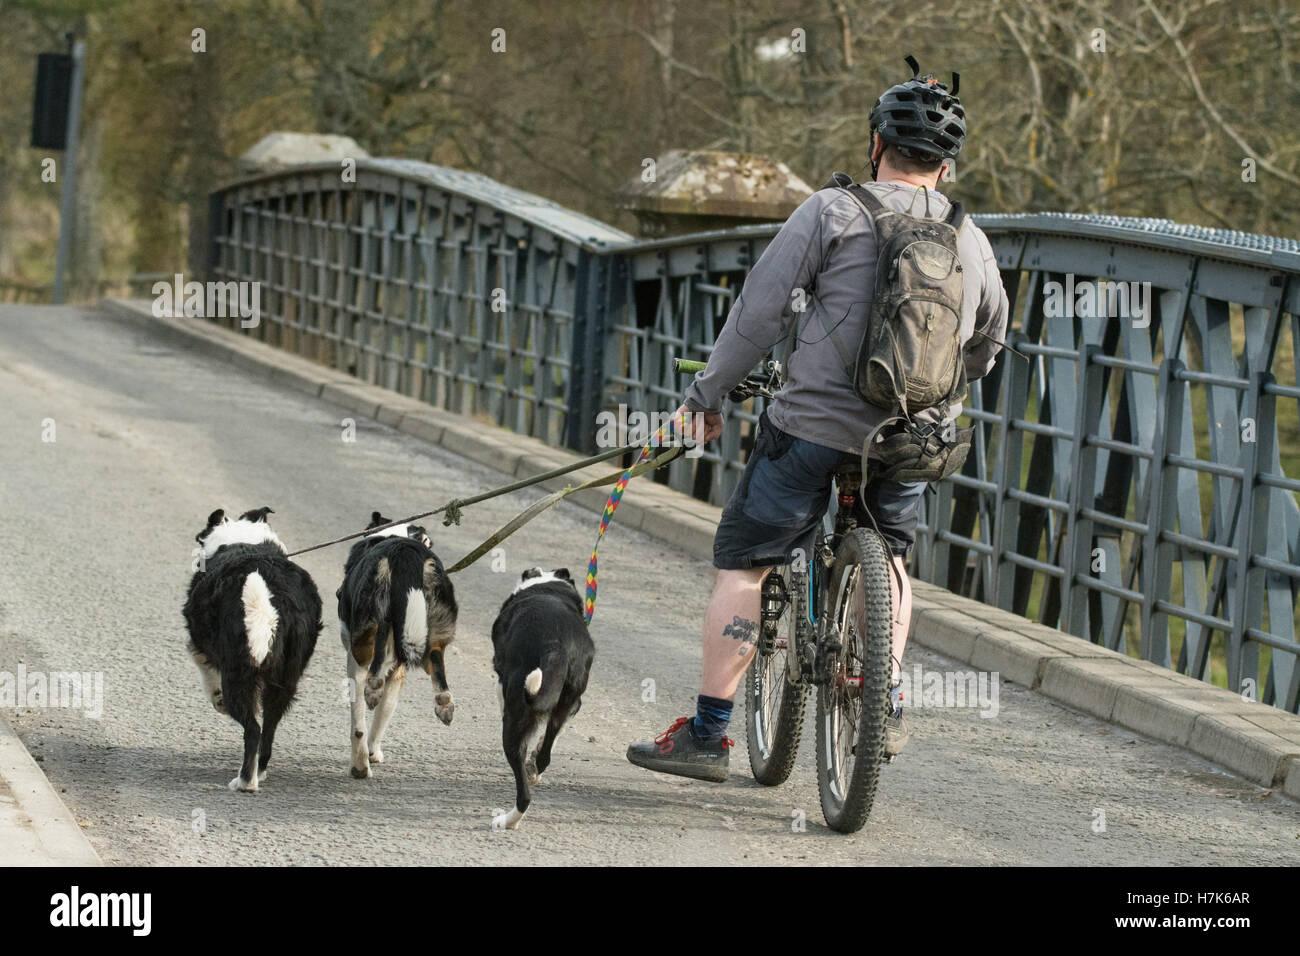 Pasear perros en bicicleta Imagen De Stock